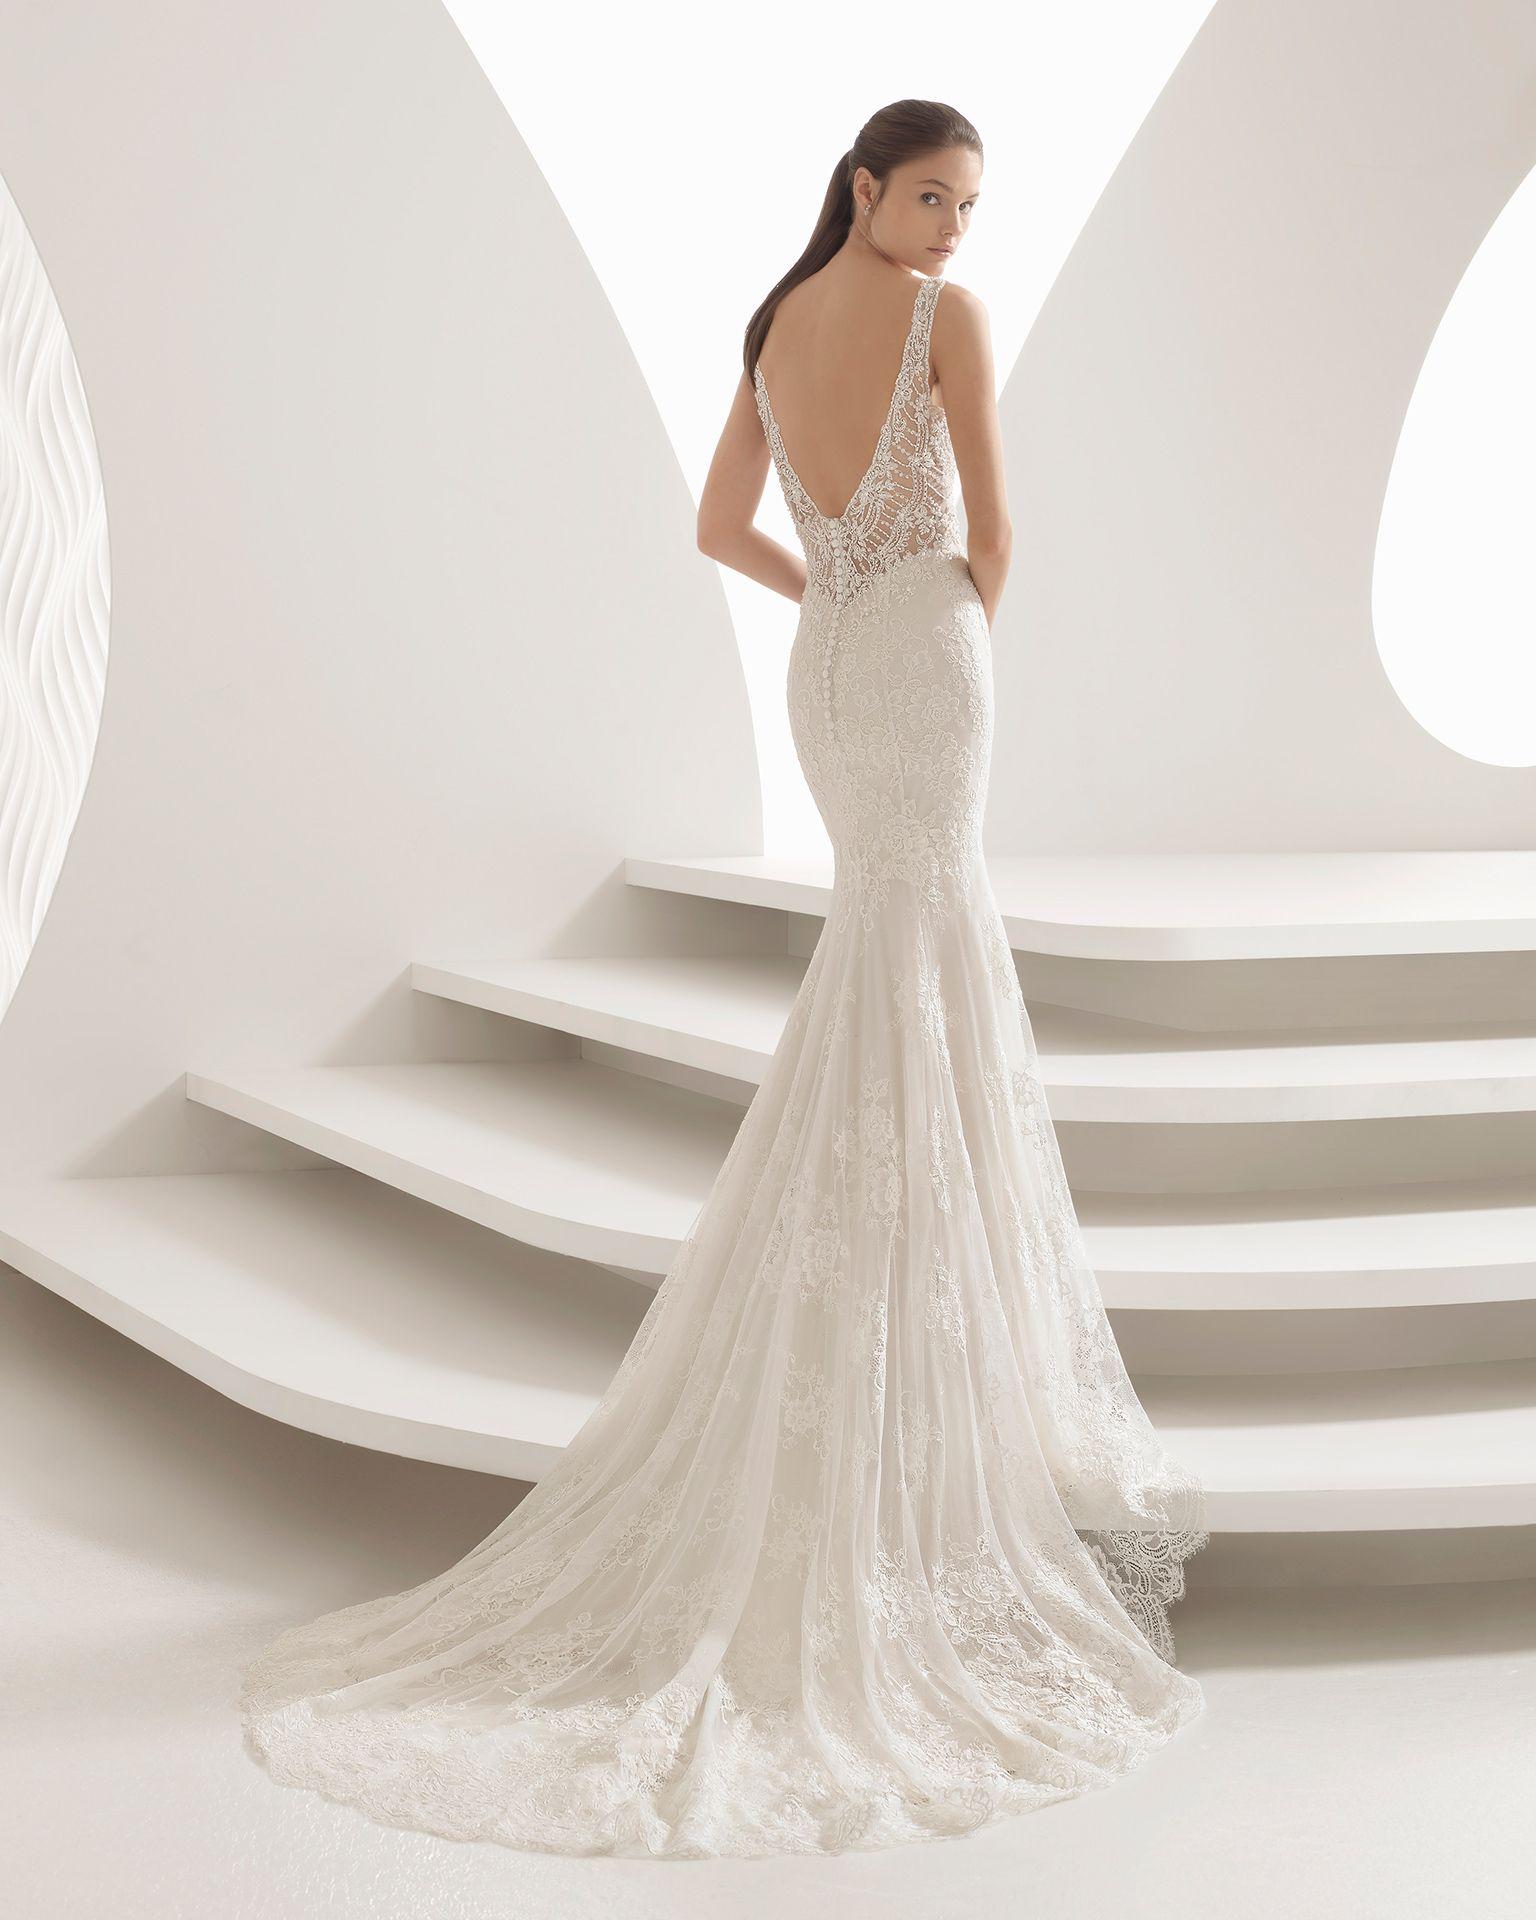 Vintage Wedding Dresses Perth: 2018 Bridal Collection. Rosa Clará Collection